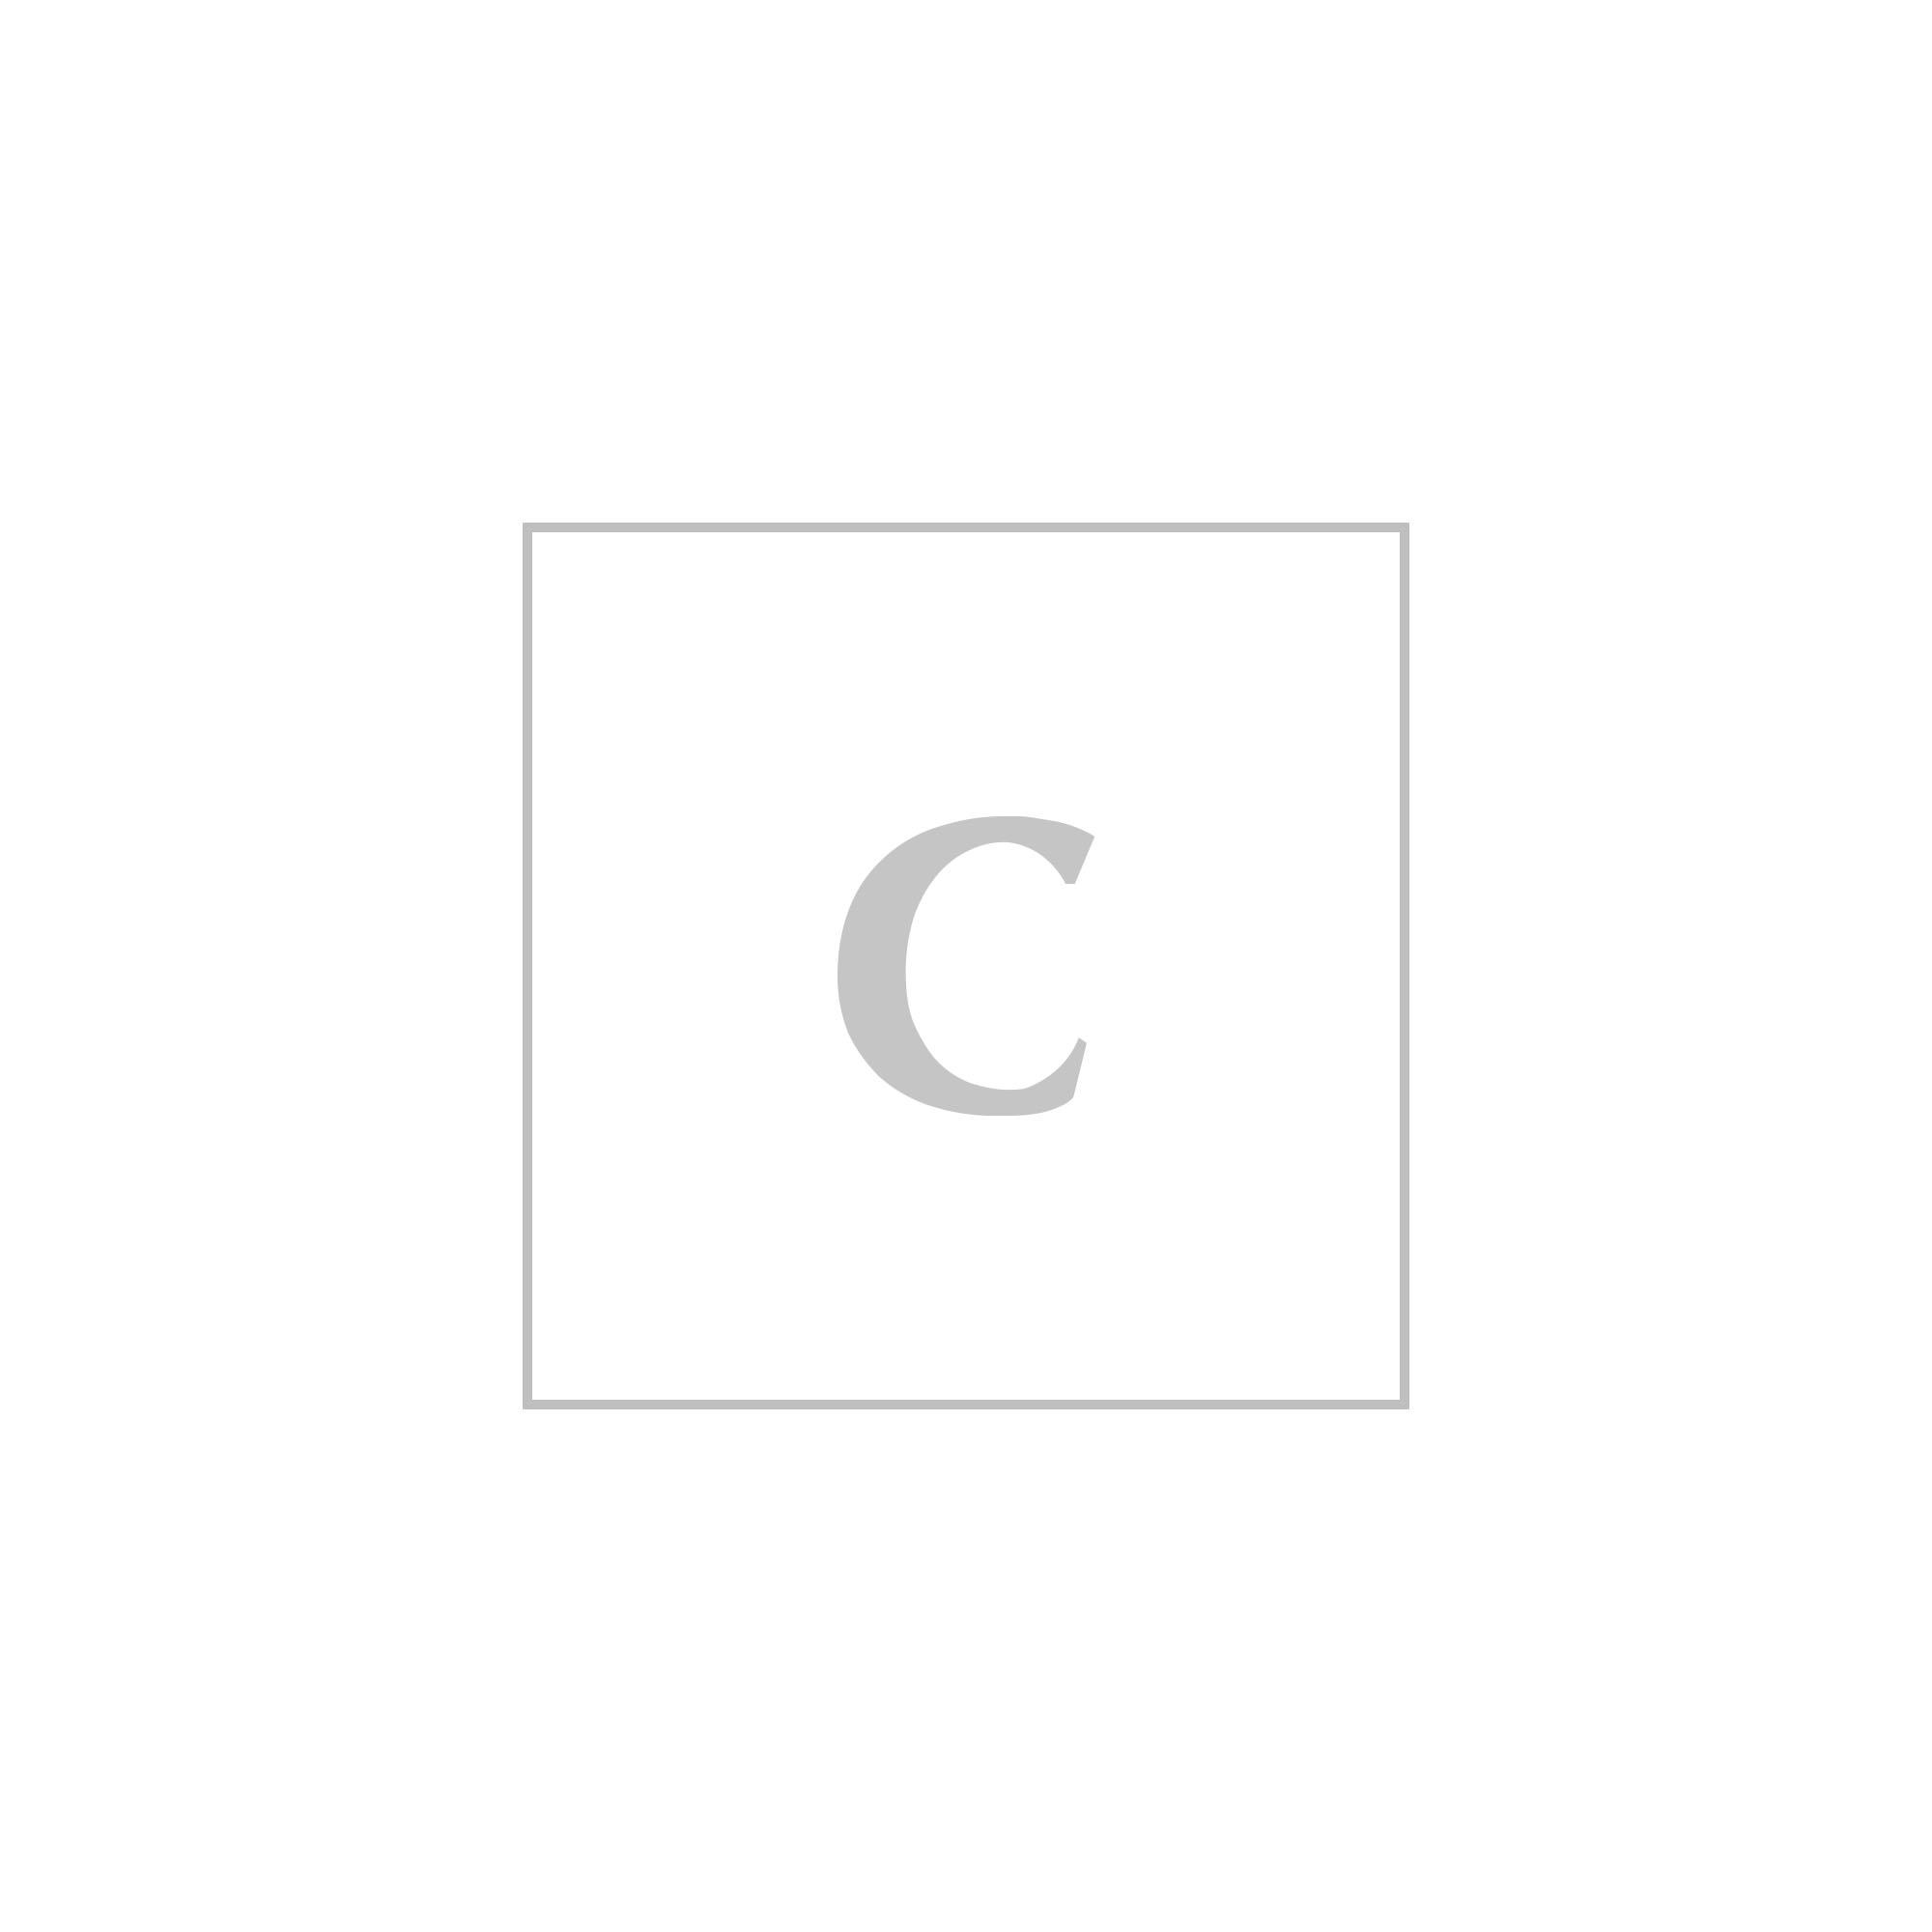 Saint laurent ysl patent monogram bag